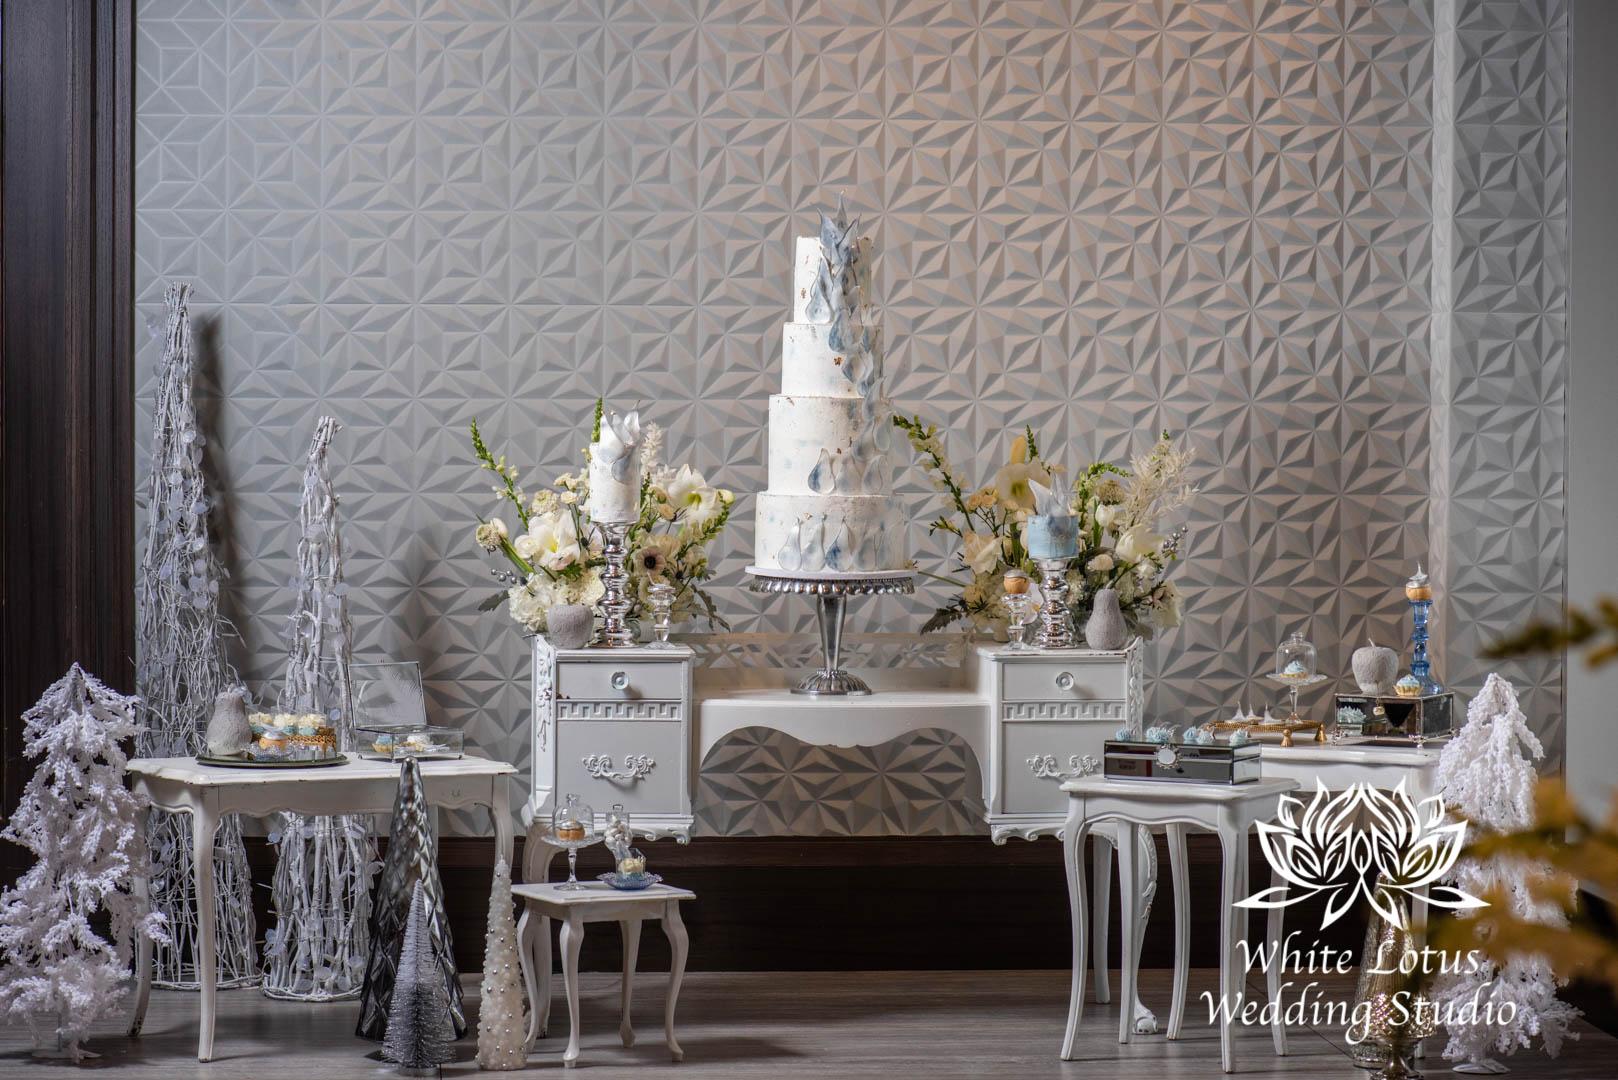 118- GLAM WINTERLUXE WEDDING INSPIRATION